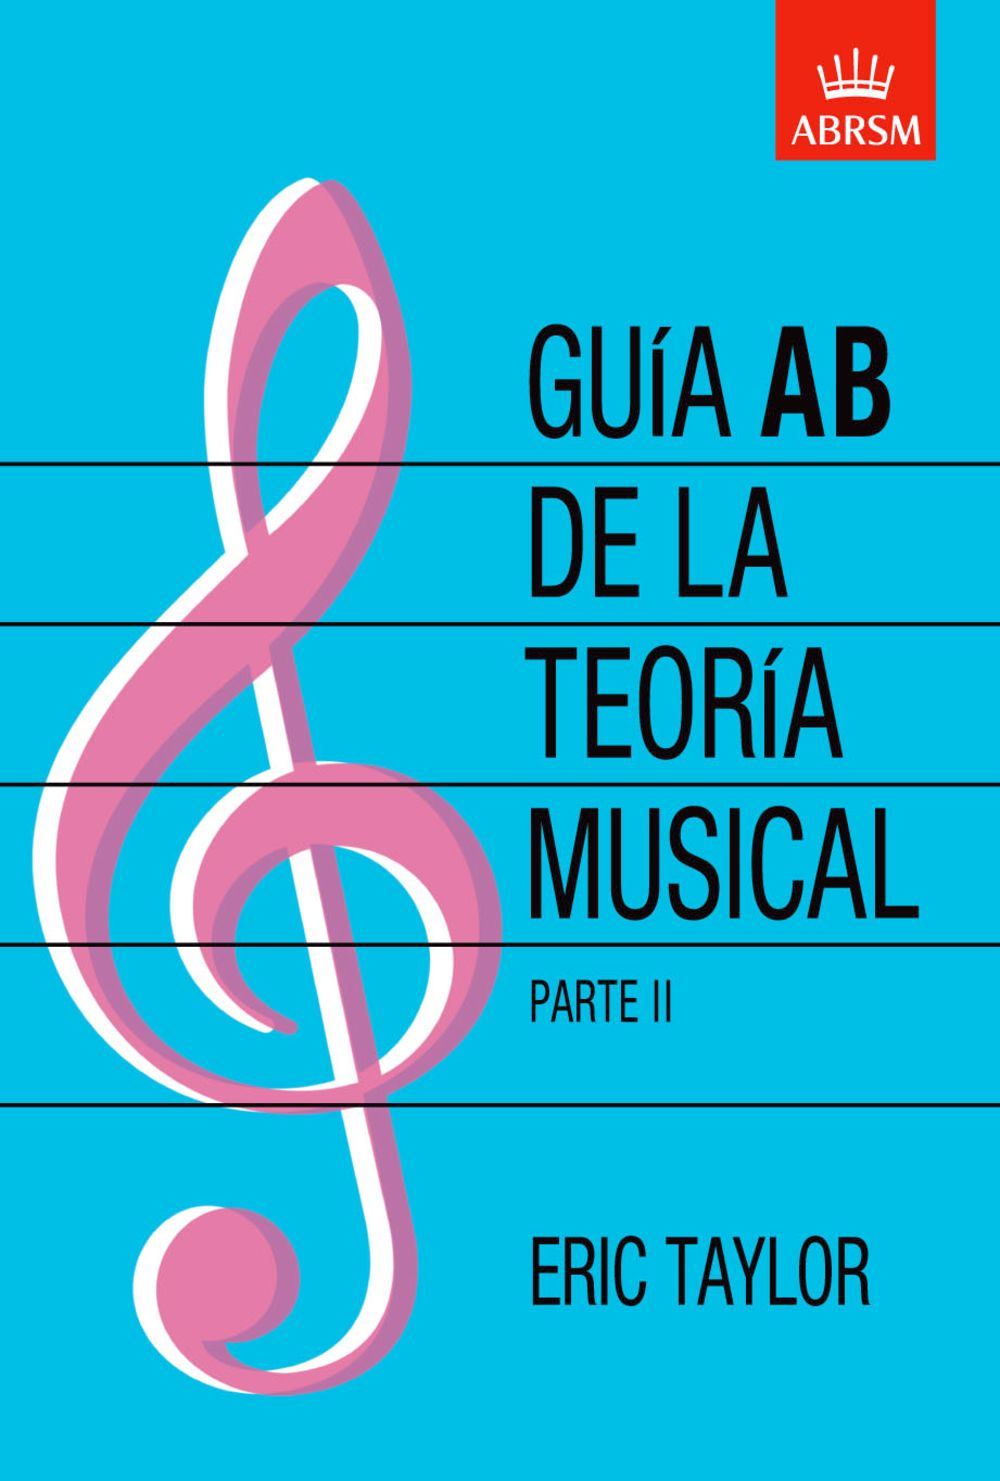 Eric Taylor: Guia AB de la teoria musical Parte 2: Theory